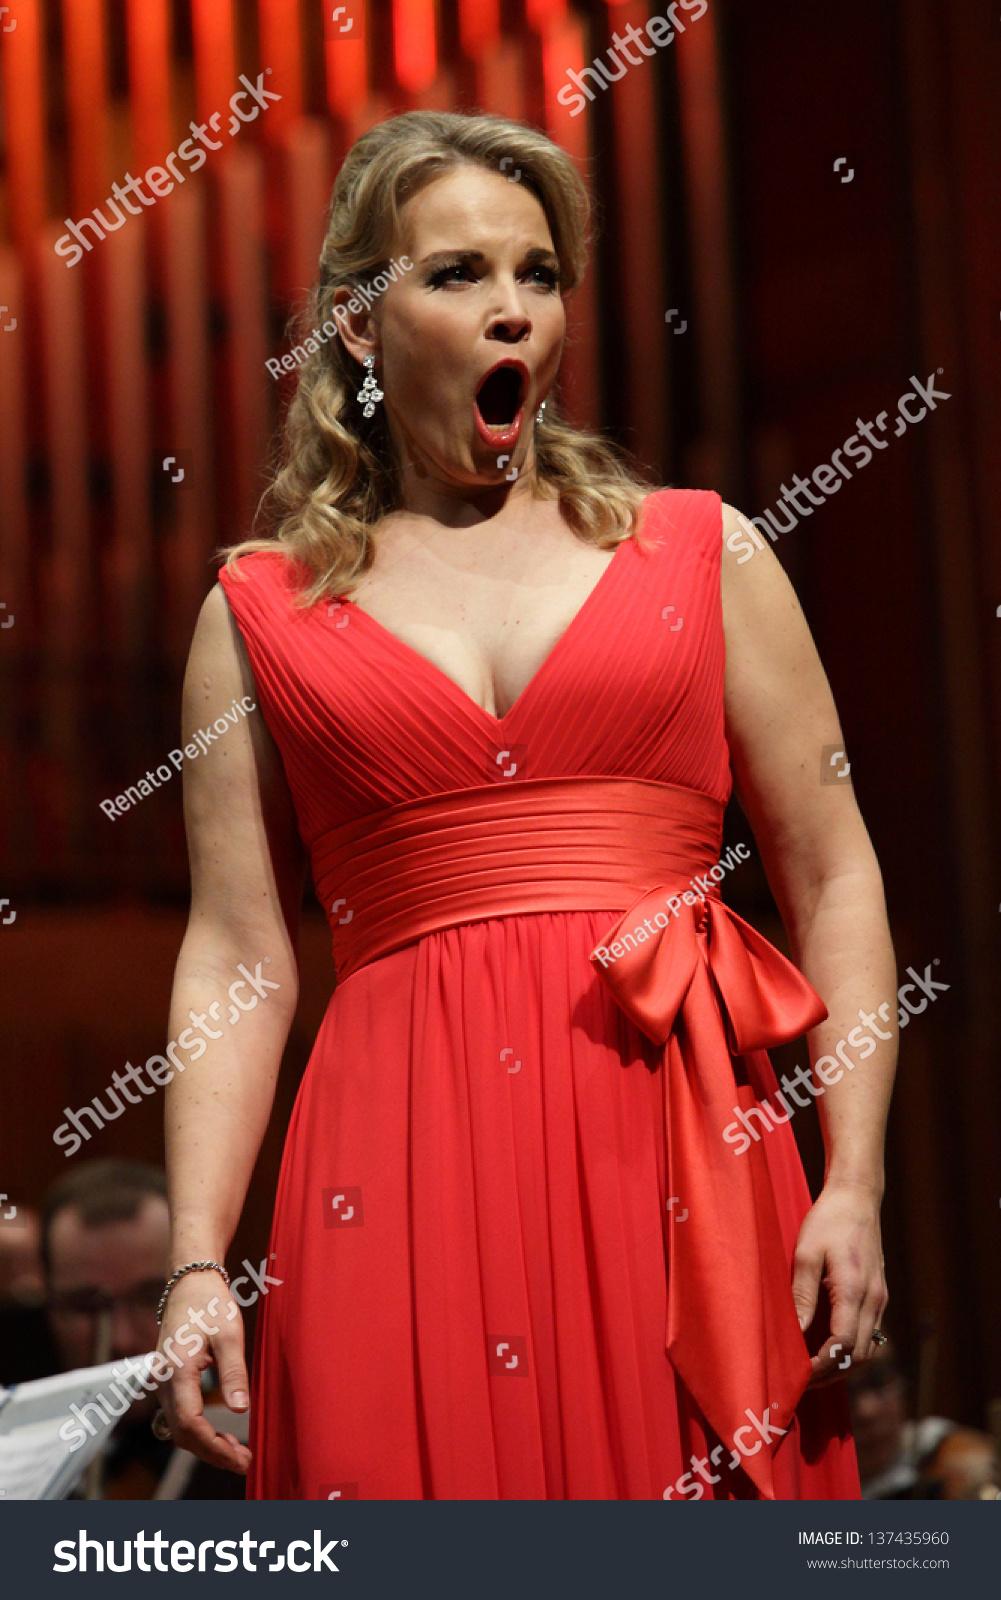 Zagreb, Croatia - January 21: World Opera Star, Mezzo-Soprano Elina Garanca Held A Concert In The Concert Hall Lisinski On January 21, 2013 In ...